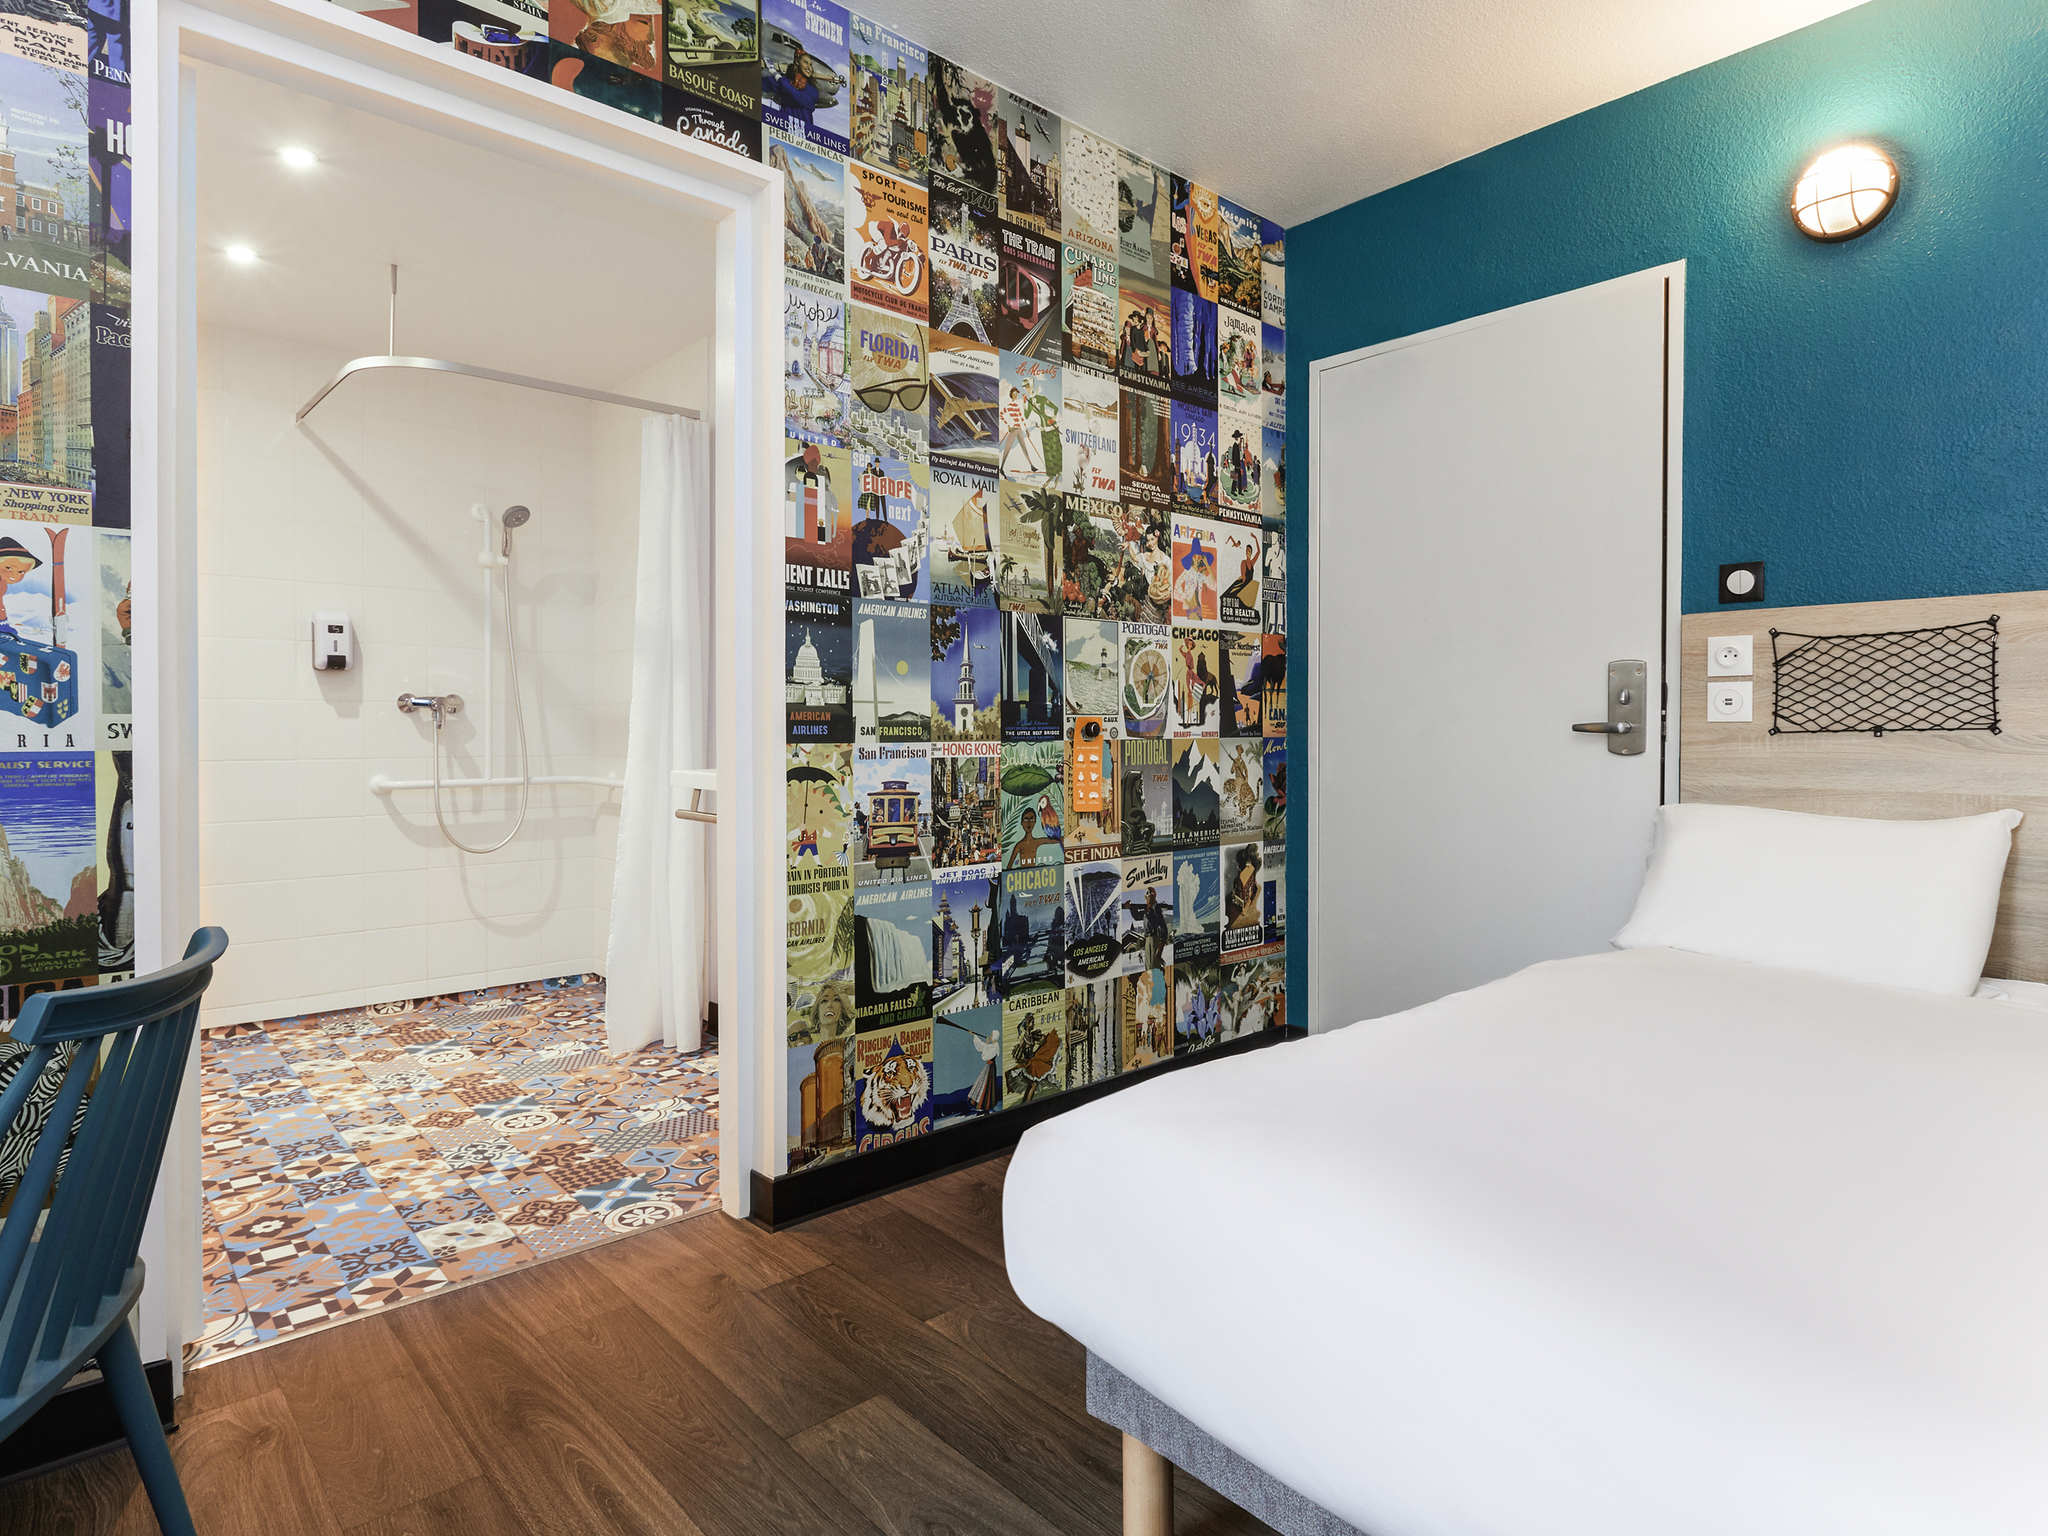 Hotell – hotelF1 Les Ulis Courtaboeuf